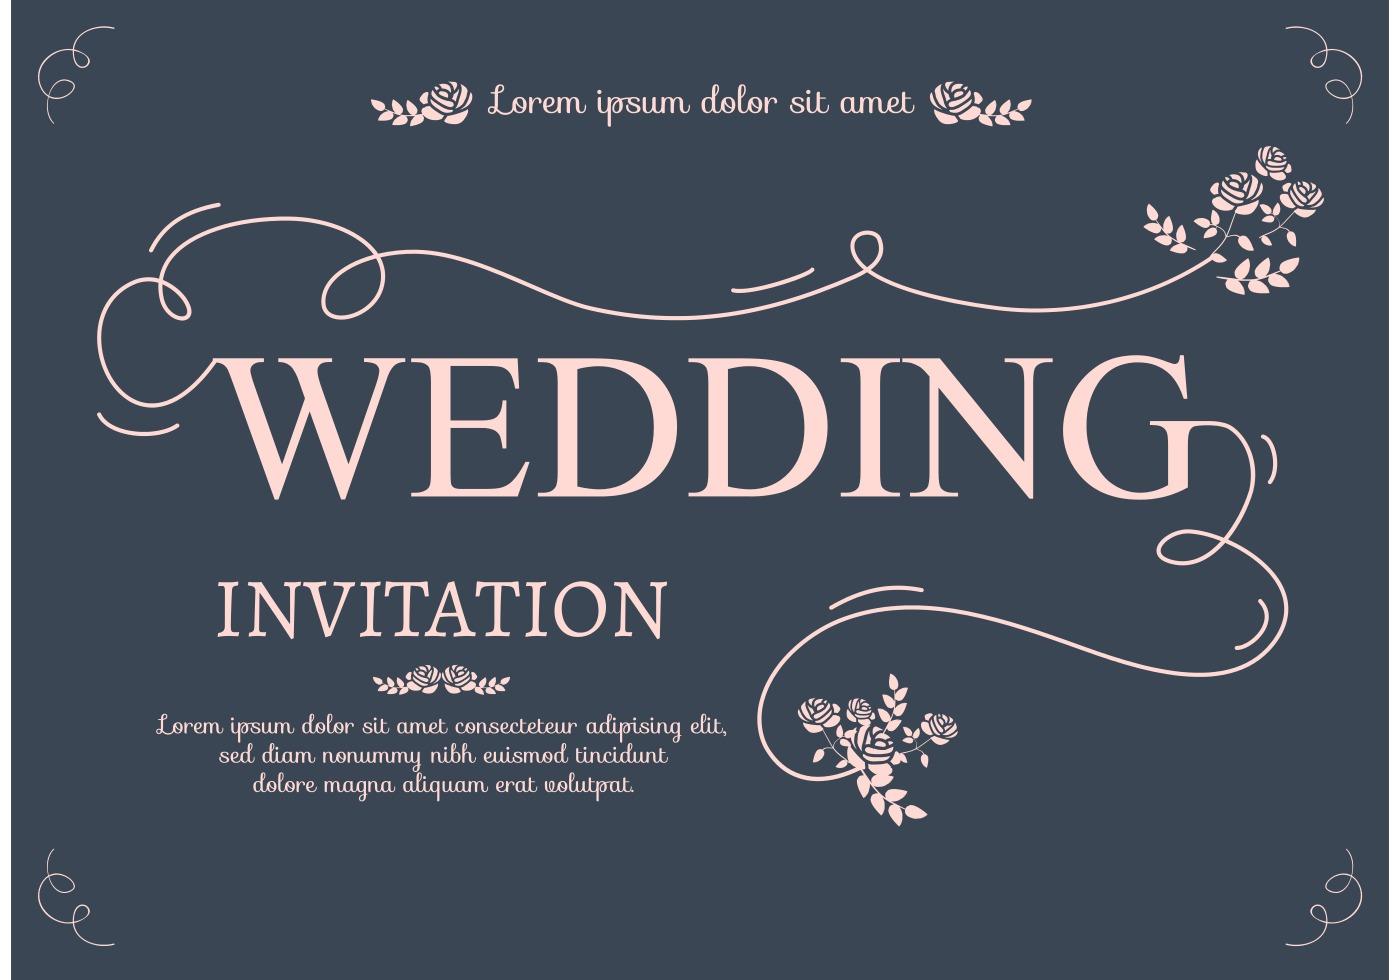 Wedding Invitation Card Download: Download Free Vector Art, Stock